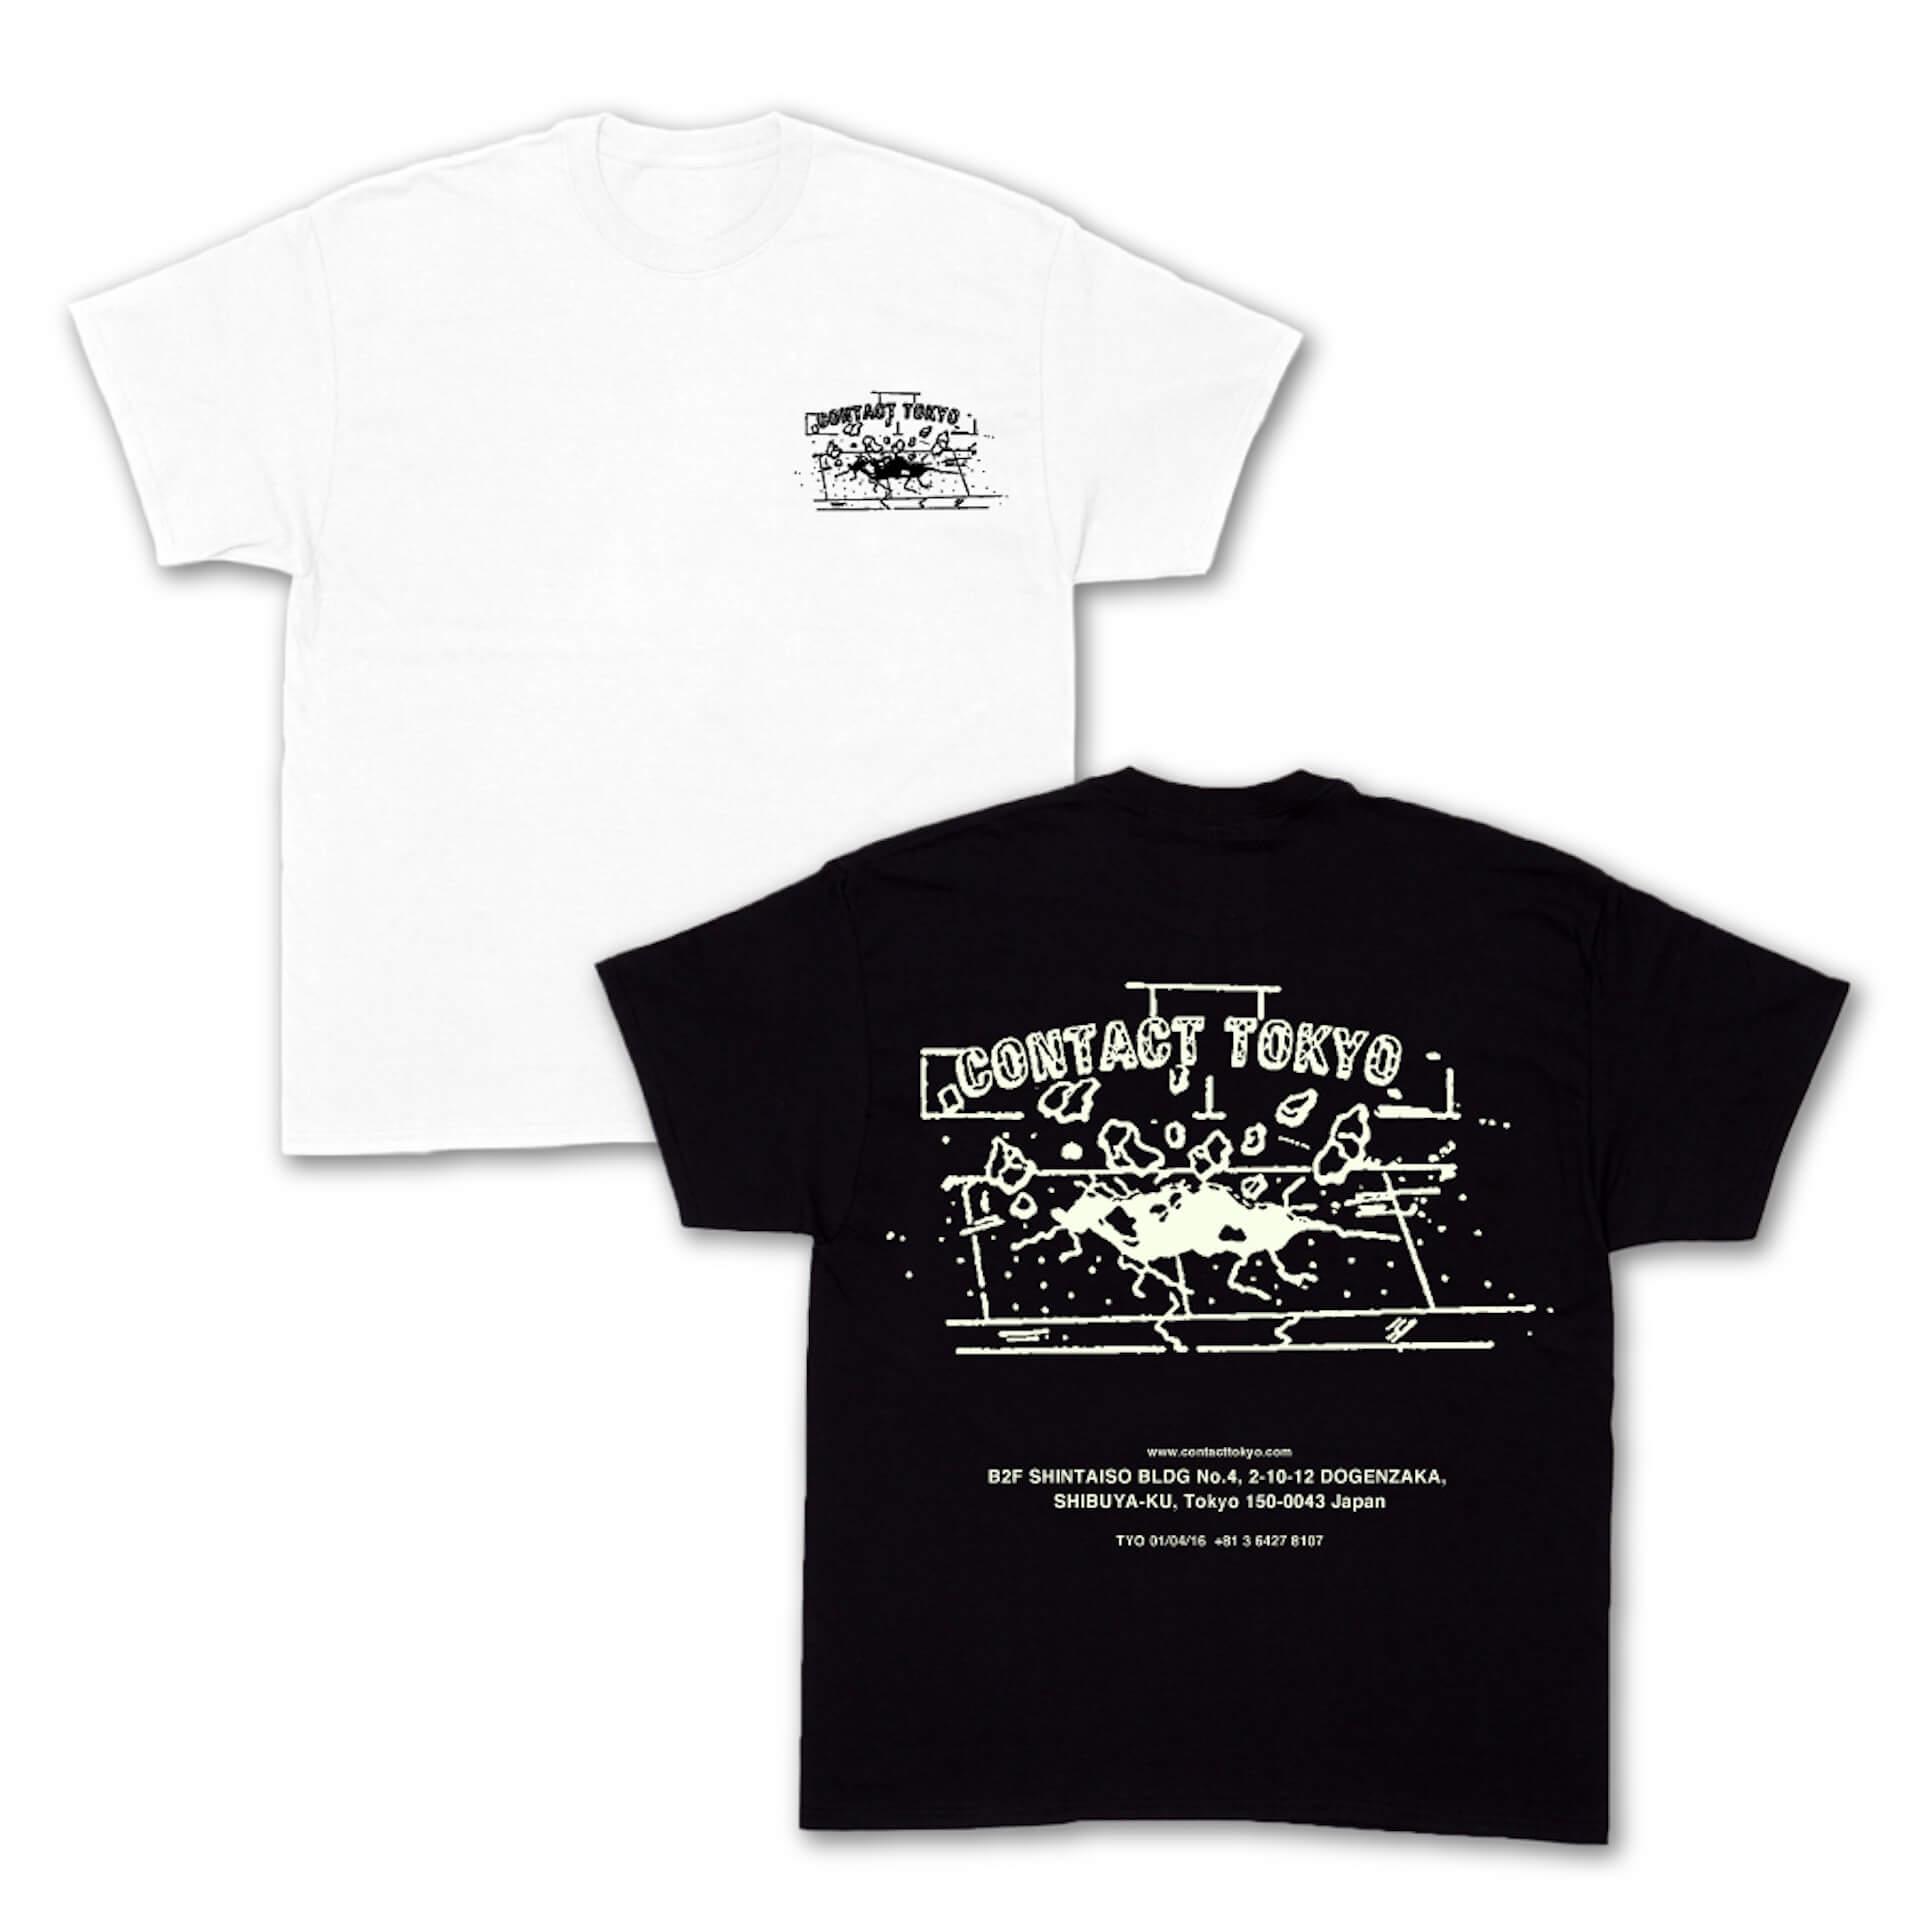 Contact Tokyo&SOUND MUSEUM VISIONのオリジナルデザインTシャツが発売決定!野村訓市、UNDERCOVER、VERDY、YAGIが参加 life210713_contact_vision_8